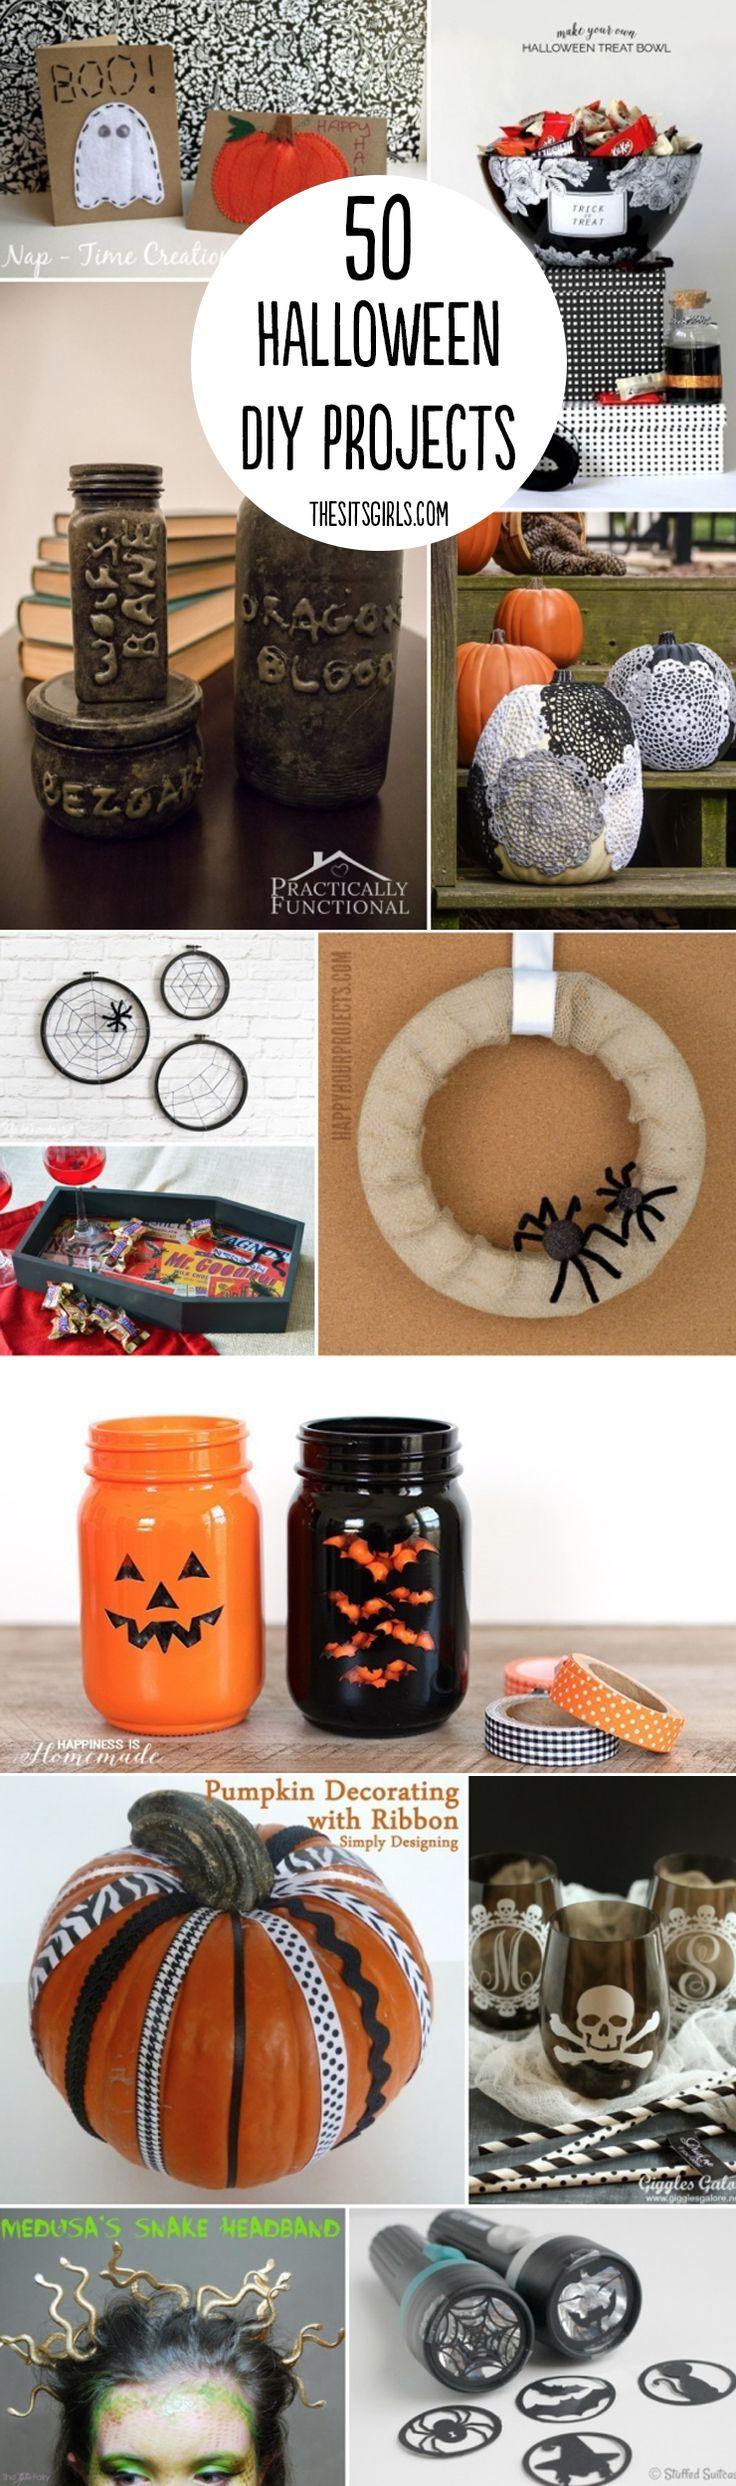 50 Halloween DIY Projects